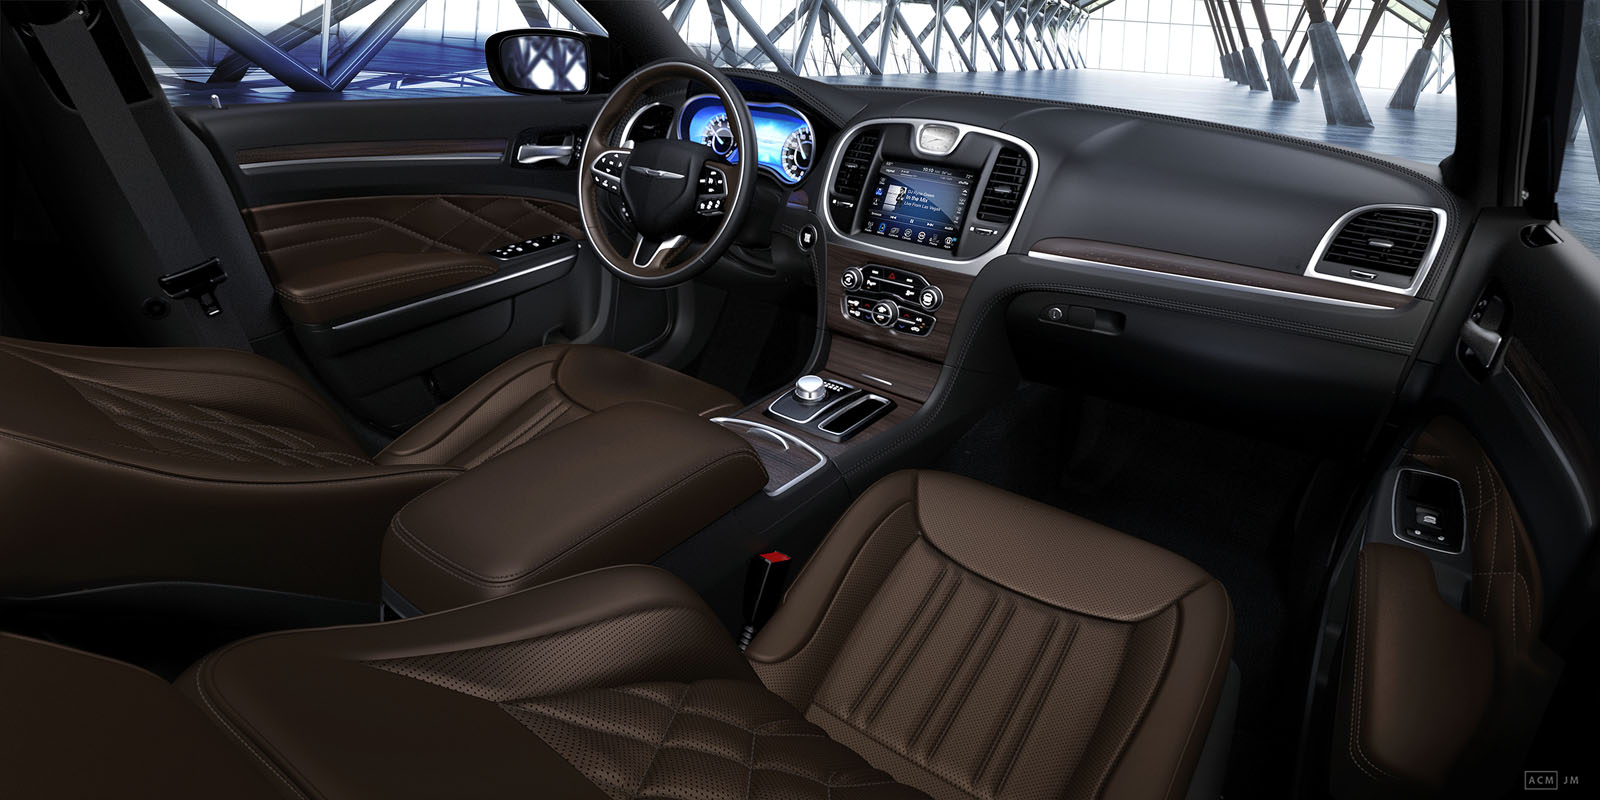 2019 Chrysler 300 Center Console